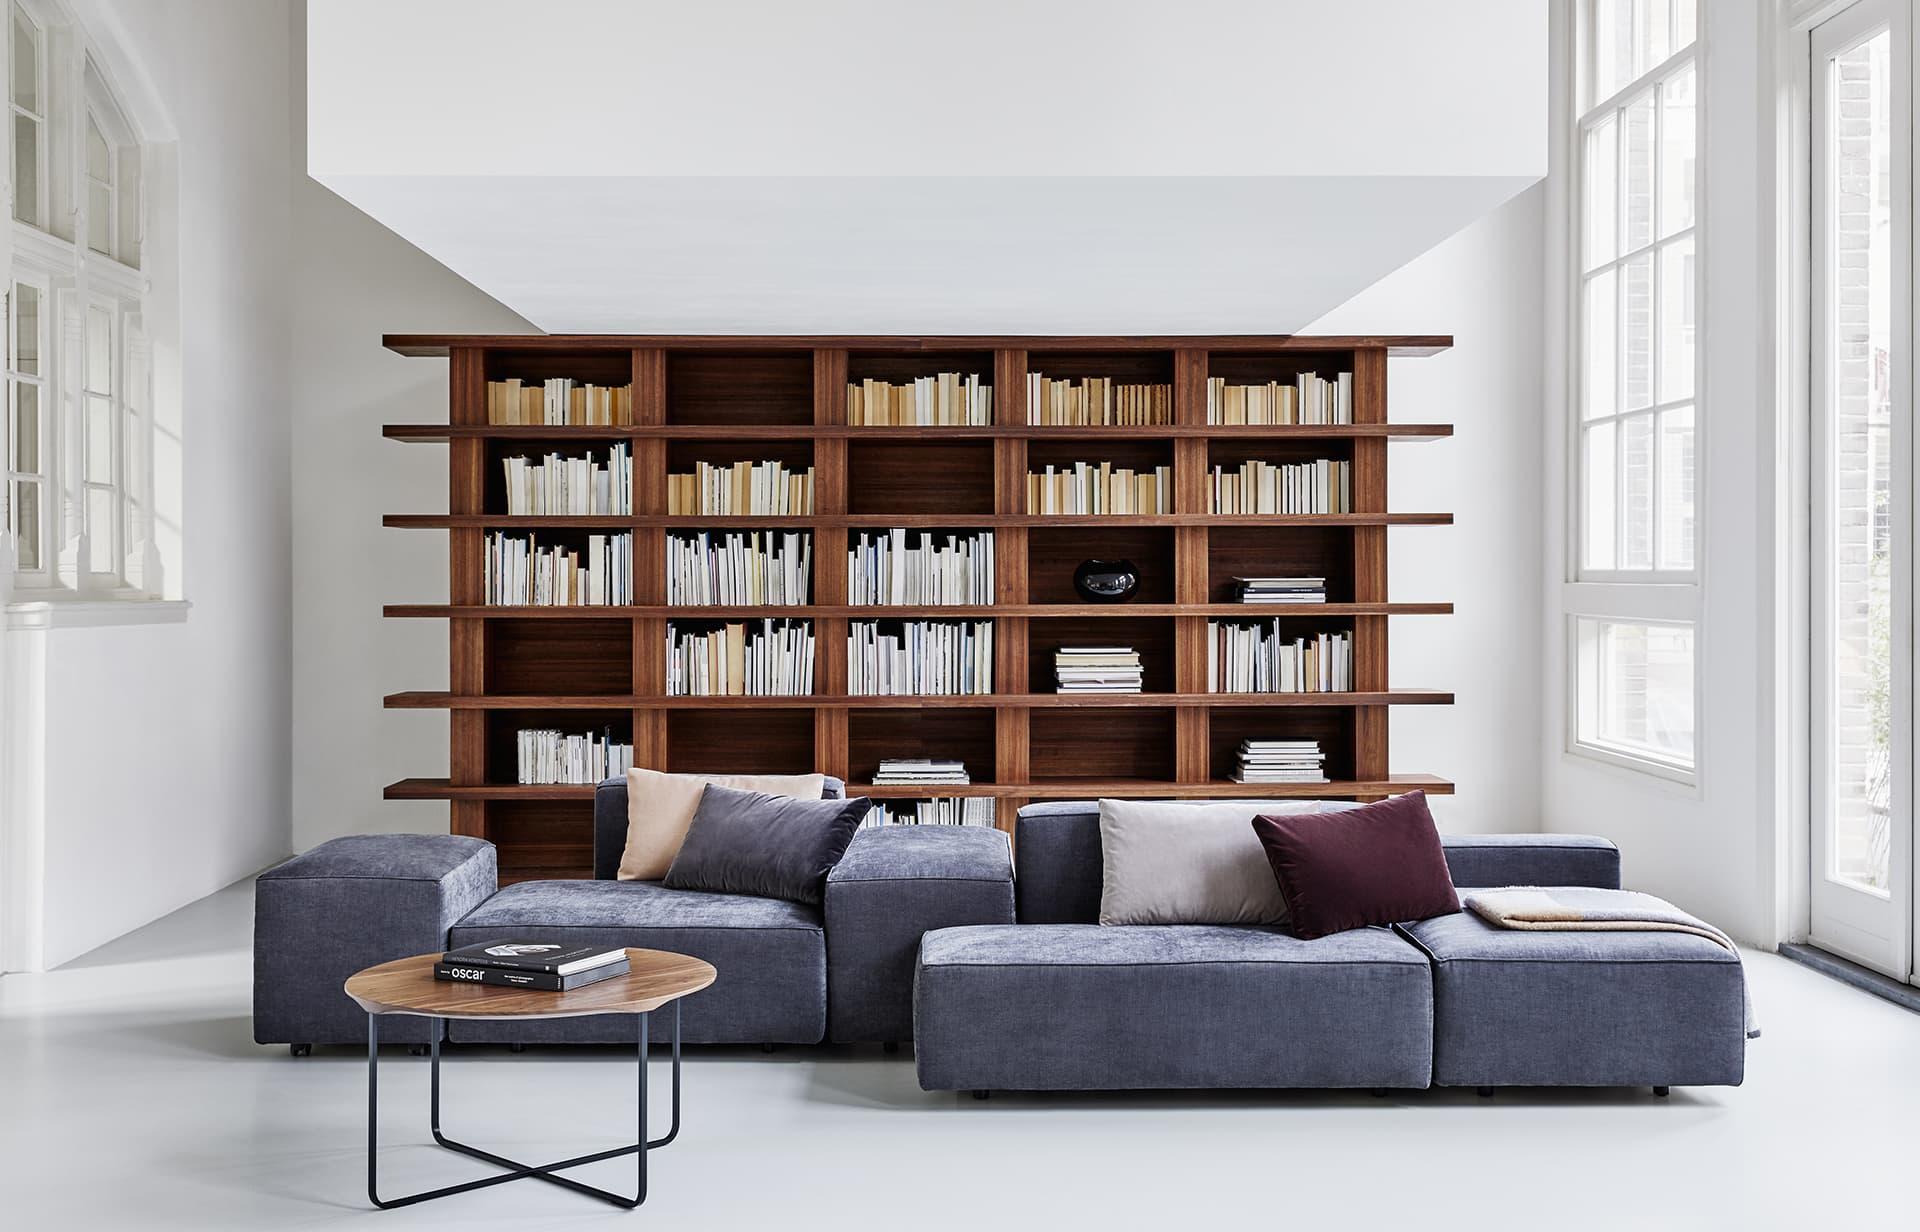 montis sofa